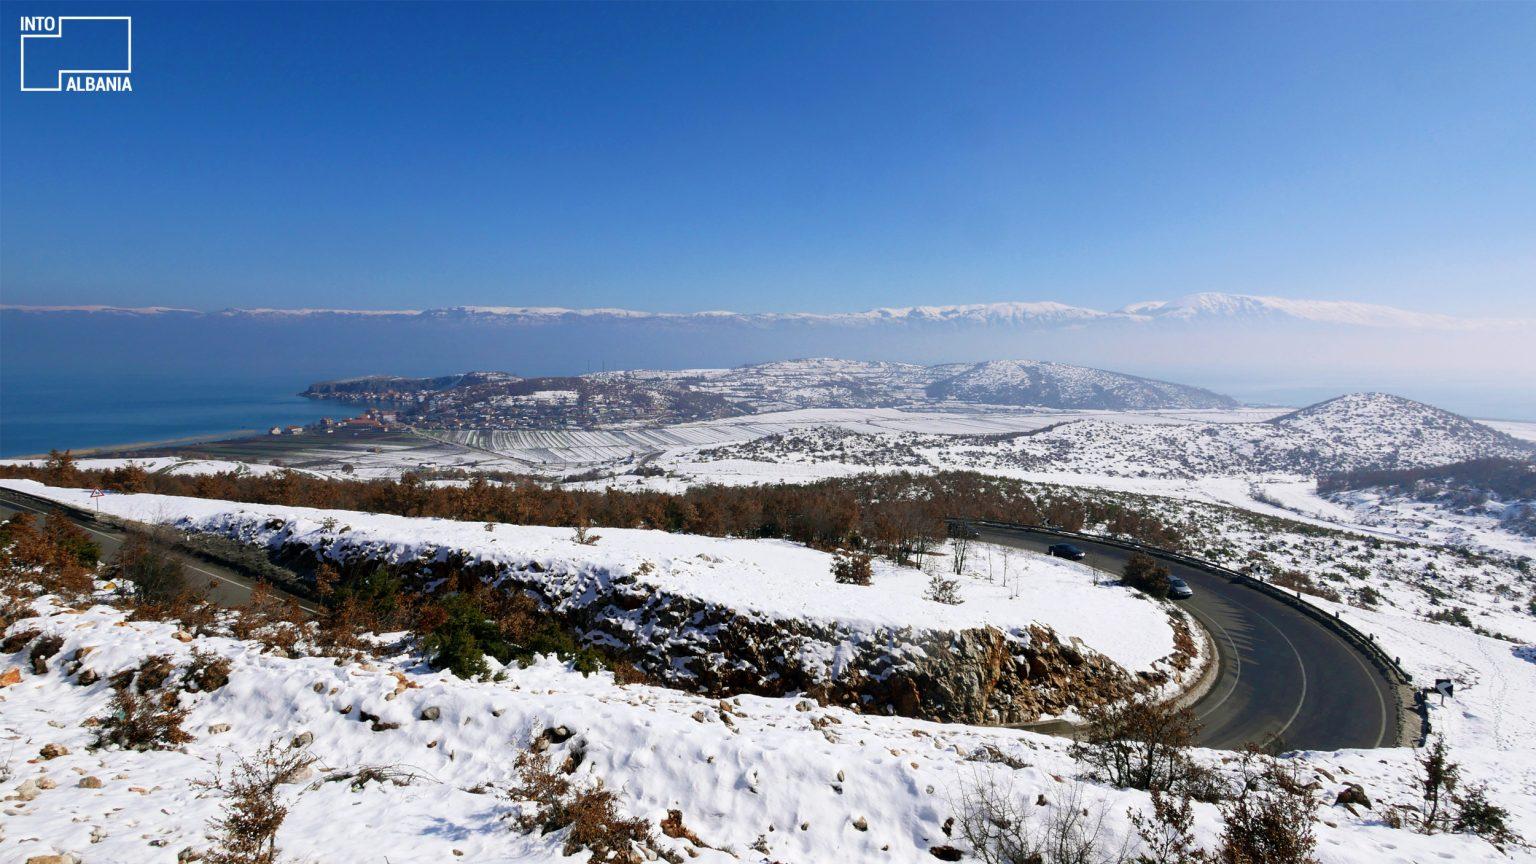 Parku Natyror i Pogradecit, foto nga IntoAlbania